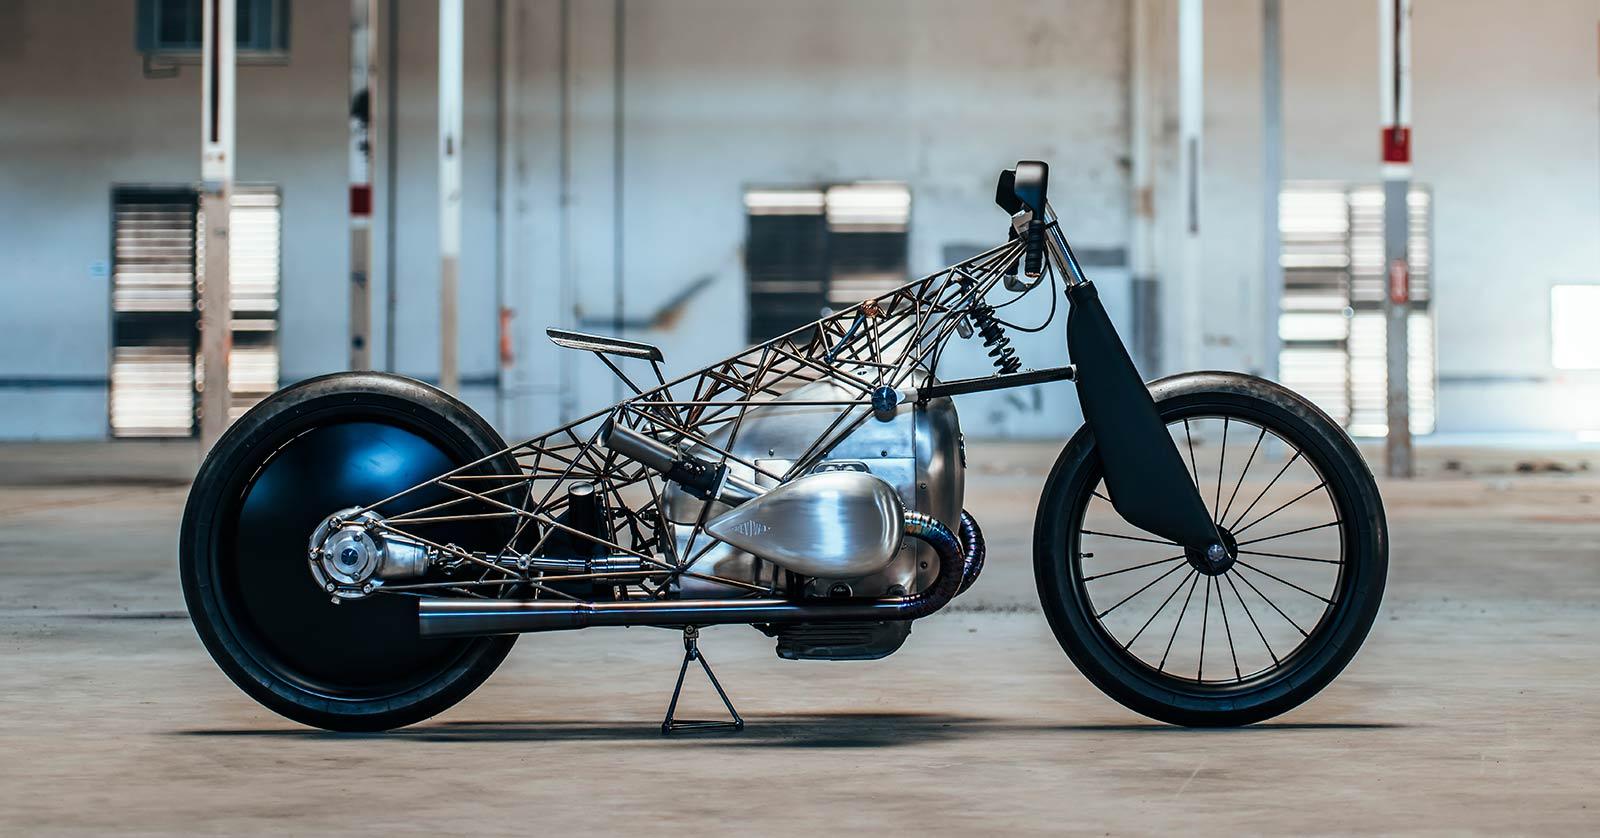 Birdcage: Revival Cycle's Titanium-Caged BMW Boxer